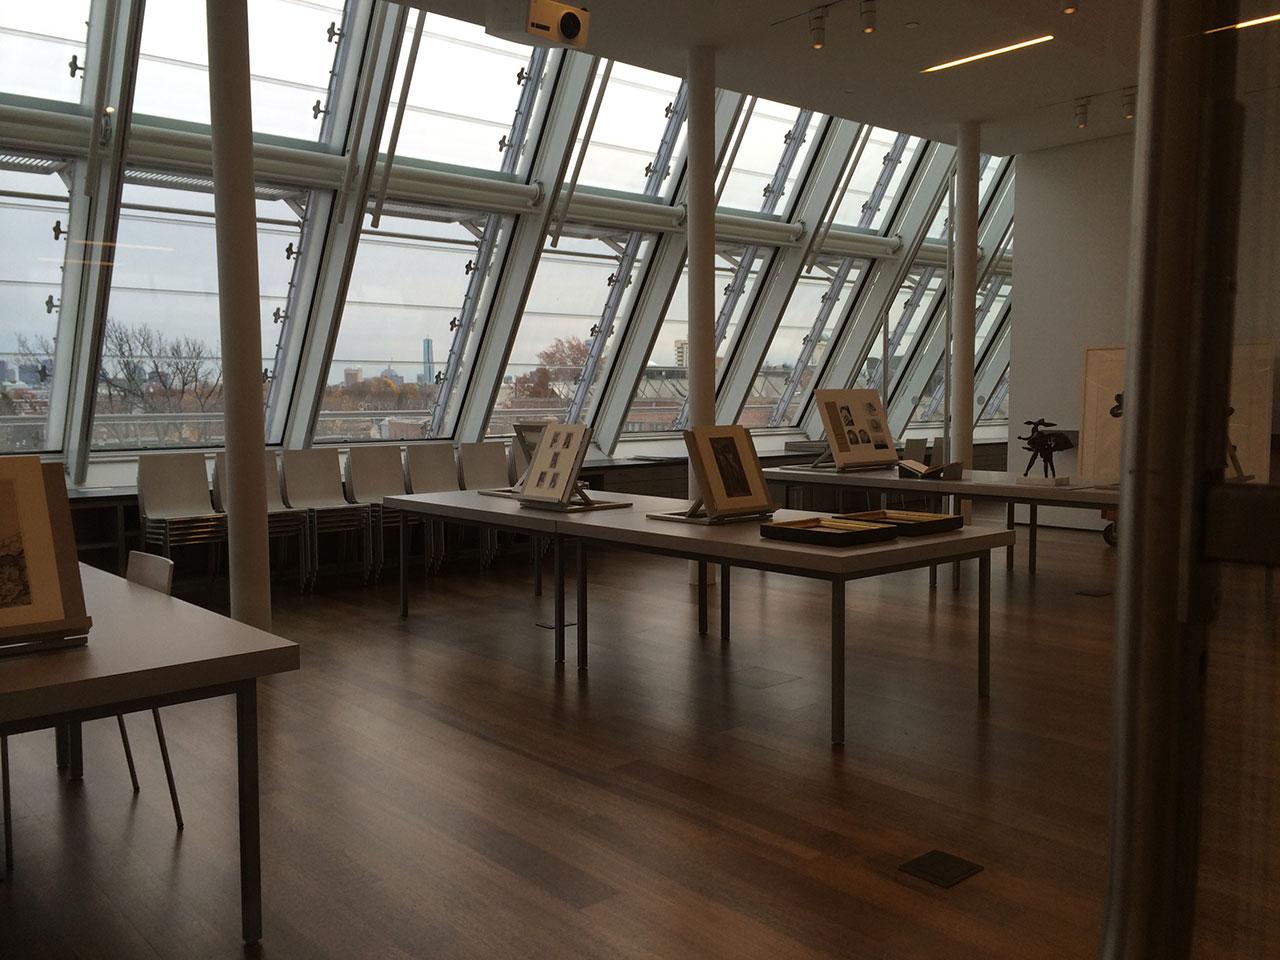 A new study center